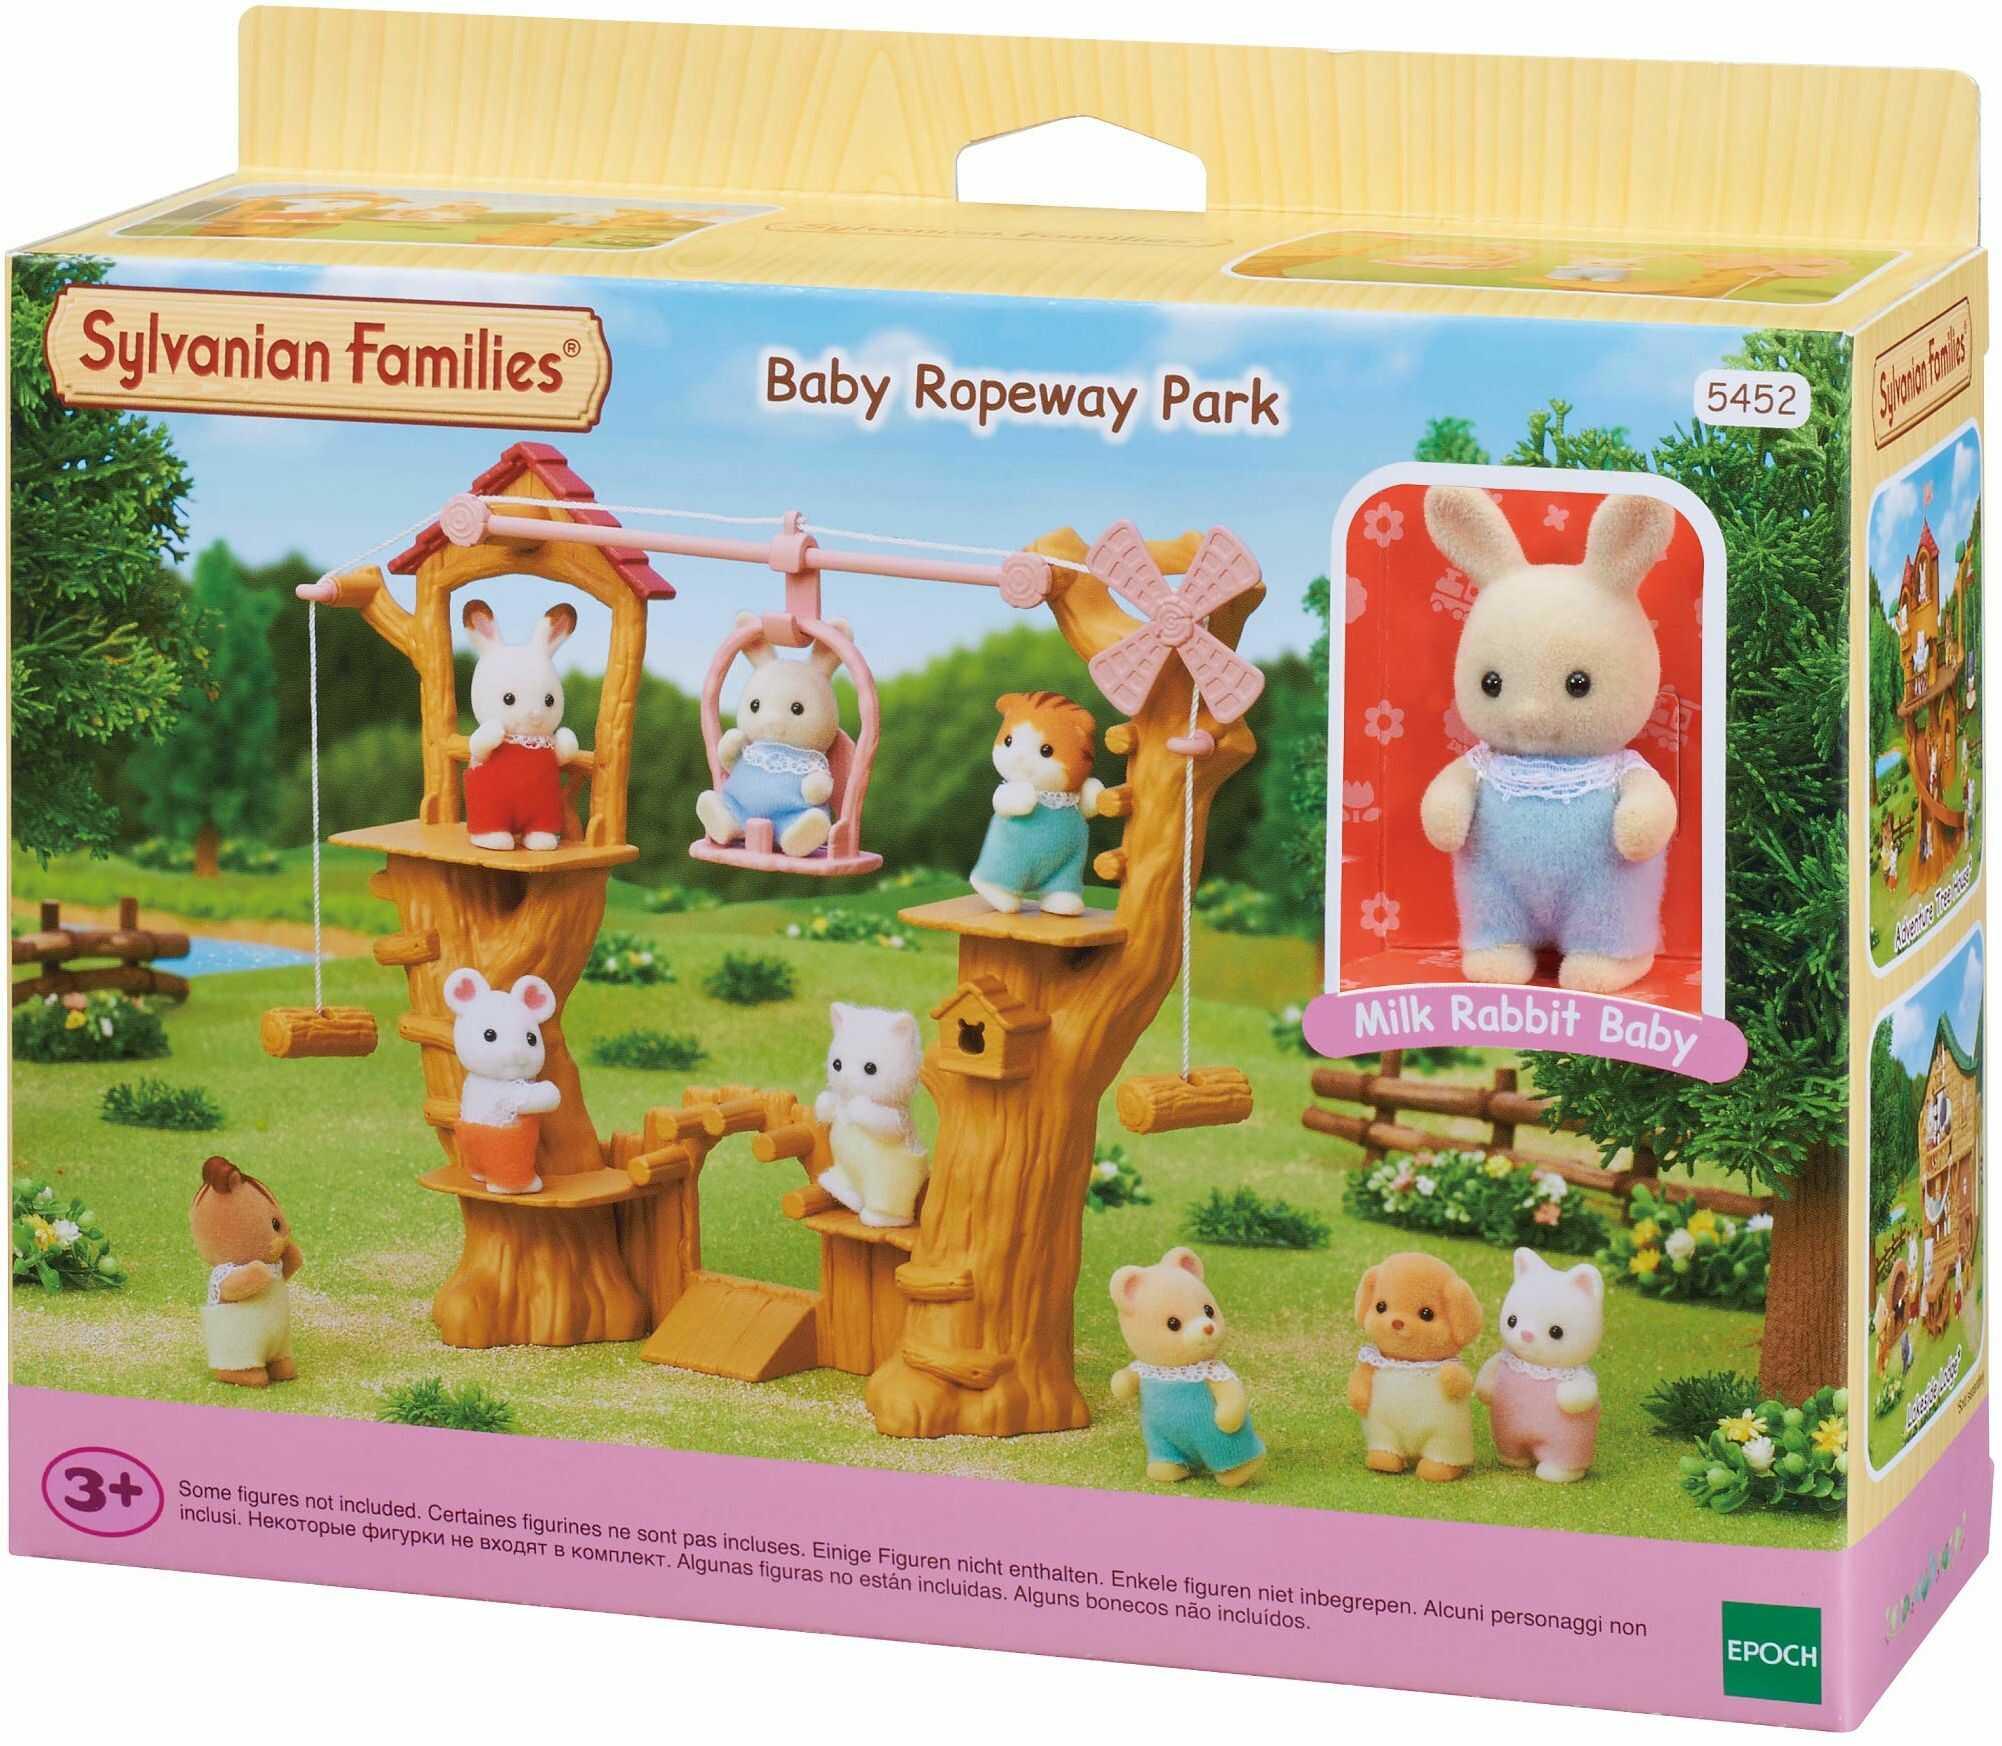 Sylvanian Families 5452 Baby Ropeway Park Playset